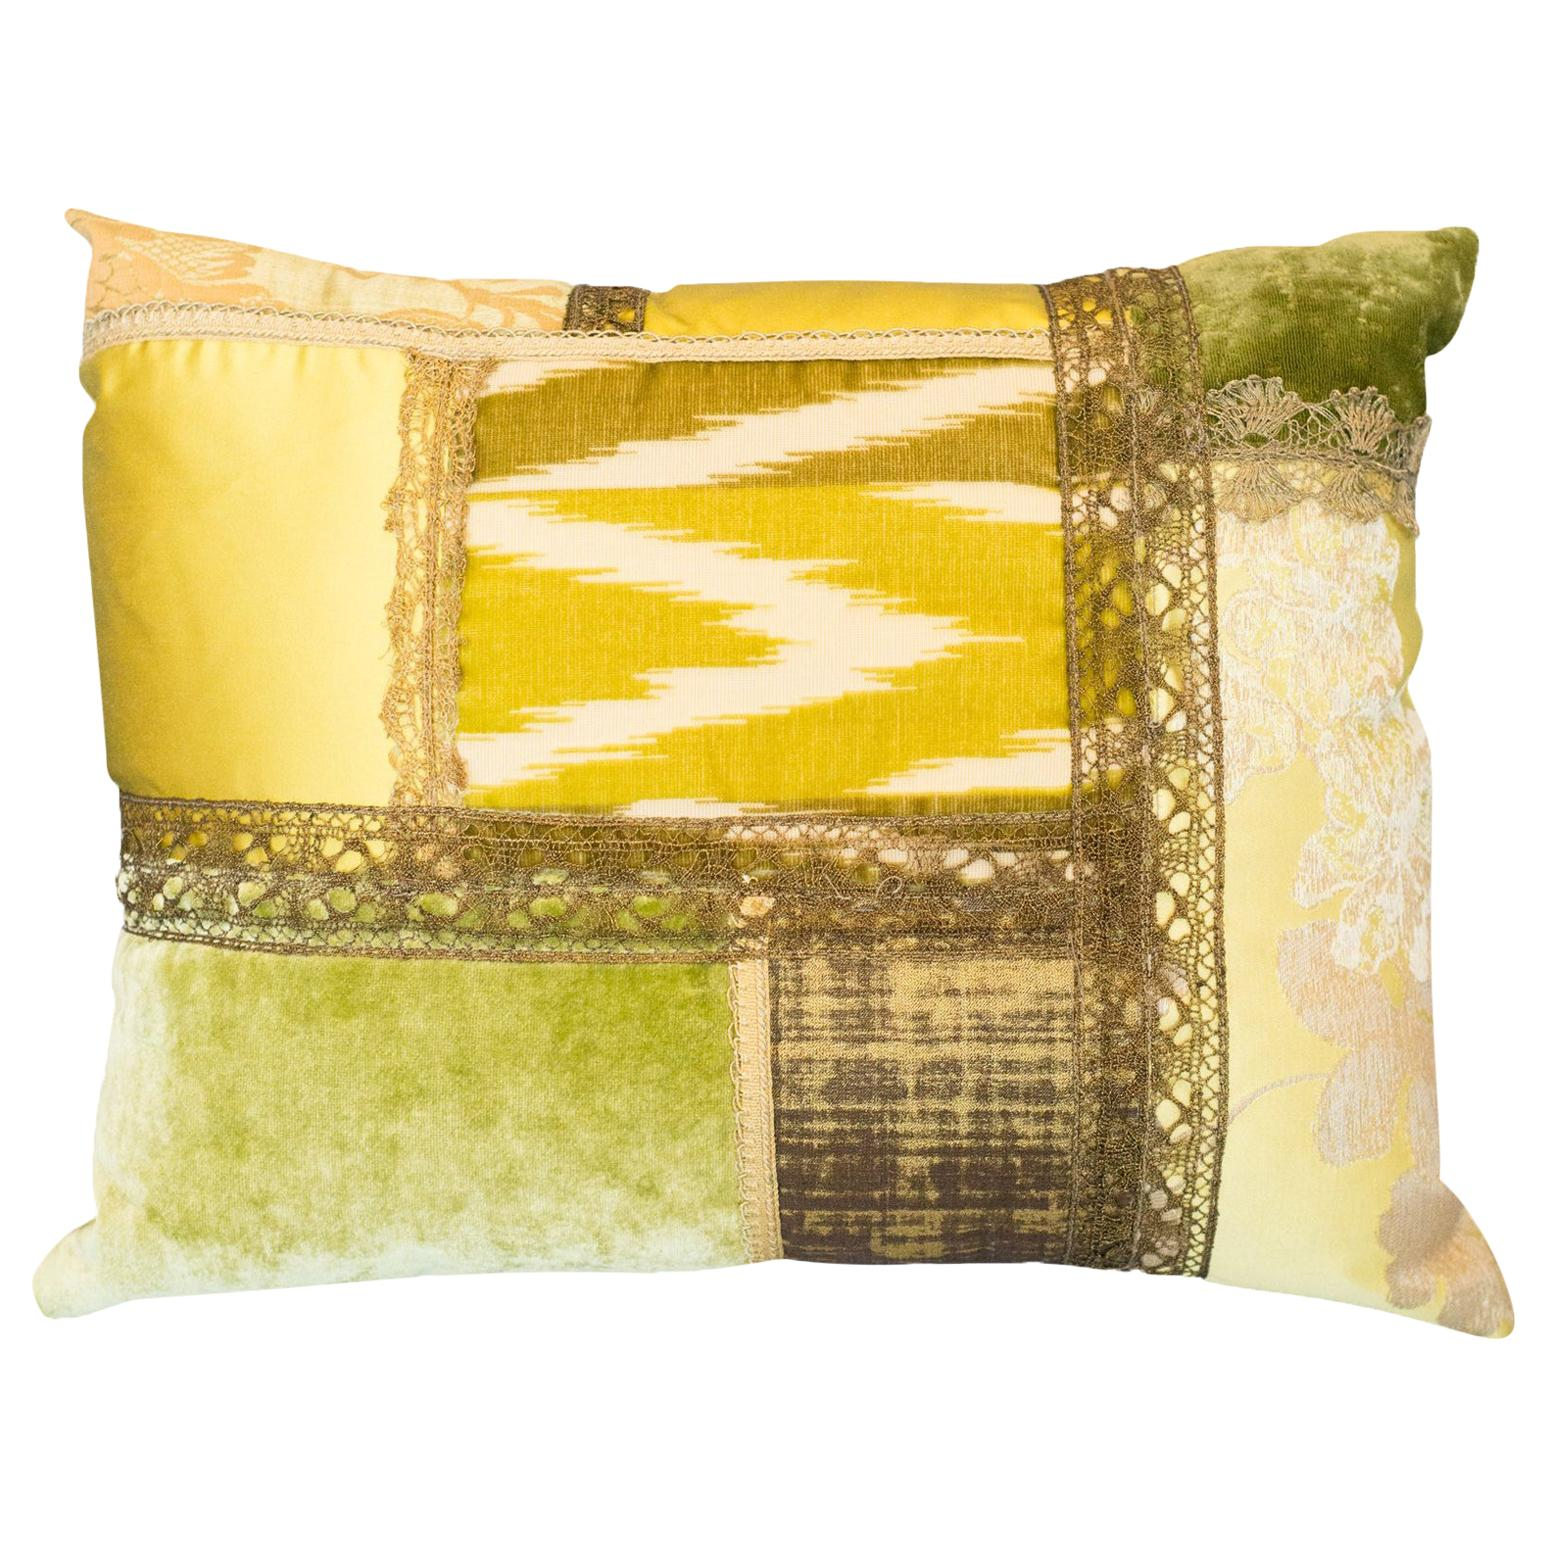 Studio Maison Nurita Patchwork Silk and Silk Velvet Pillow with Metallic Trims